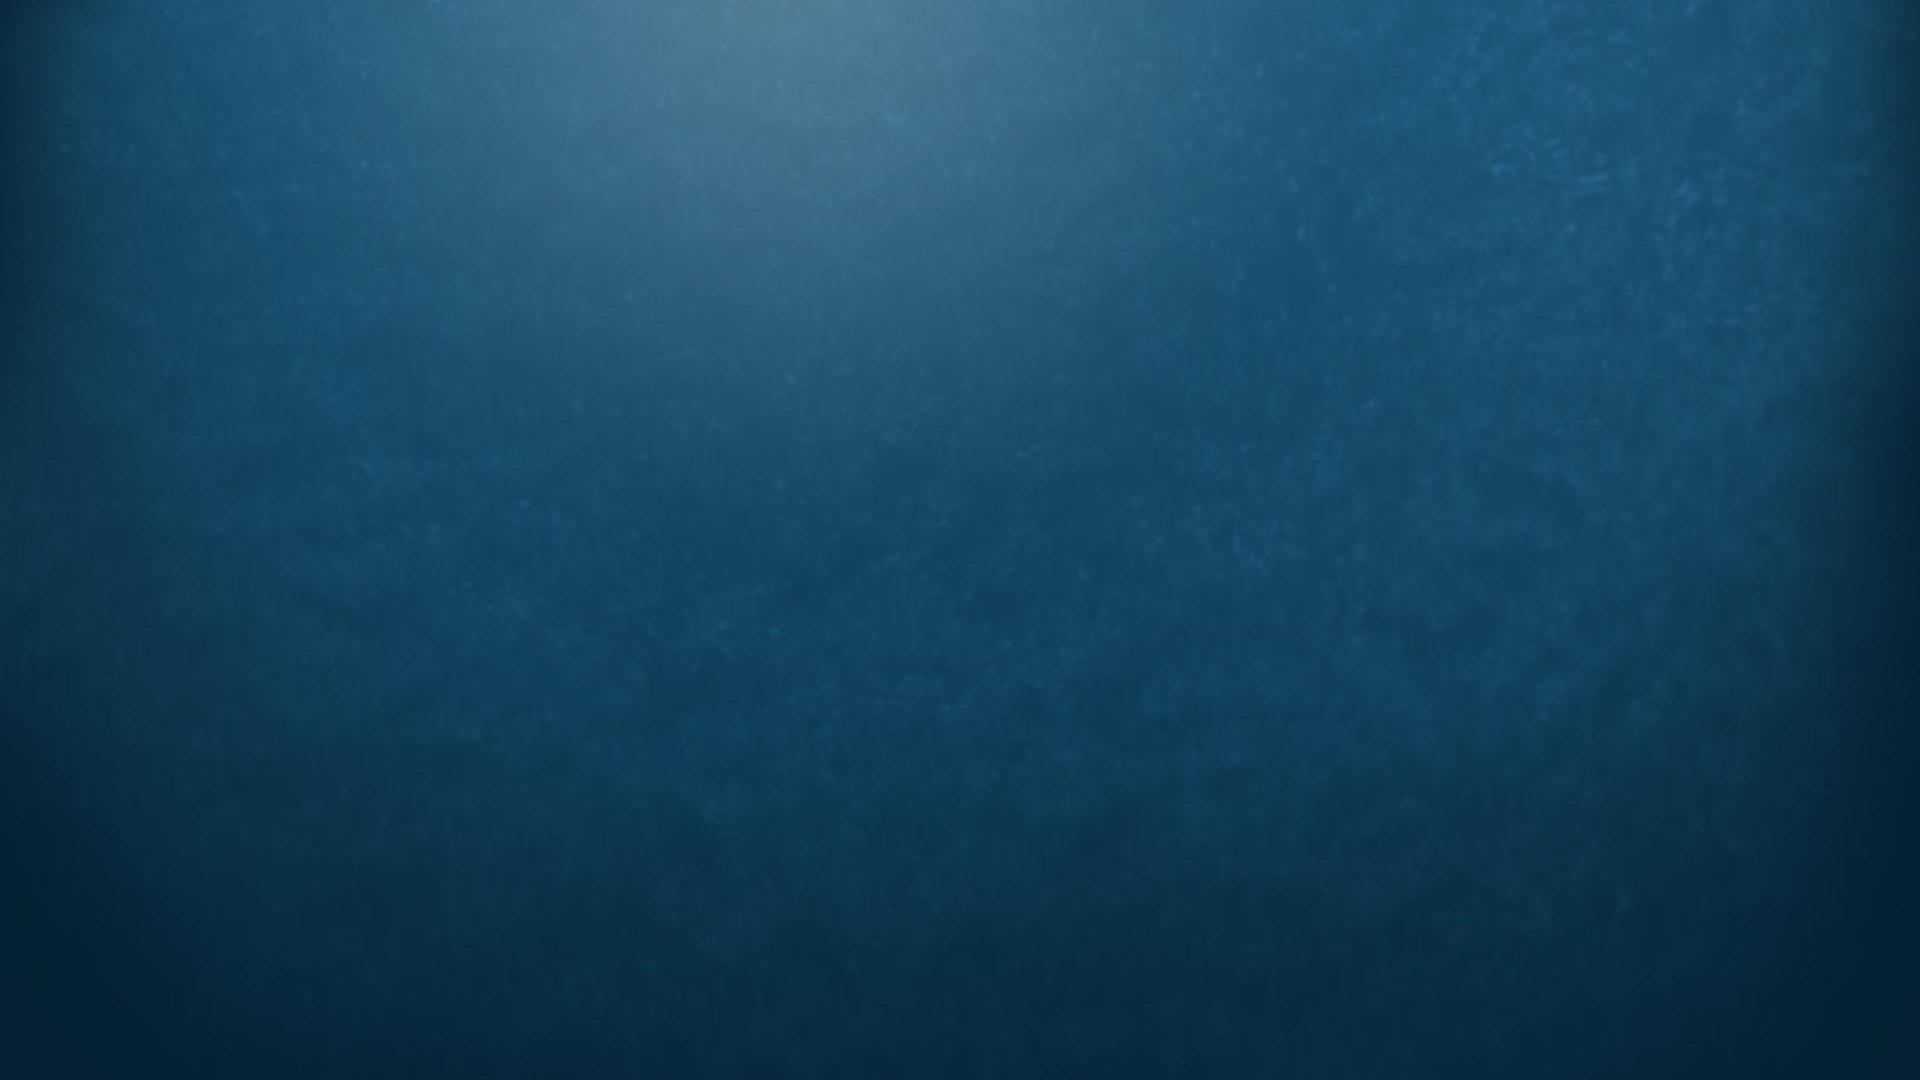 plain blue wallpaper hd wallpaper background